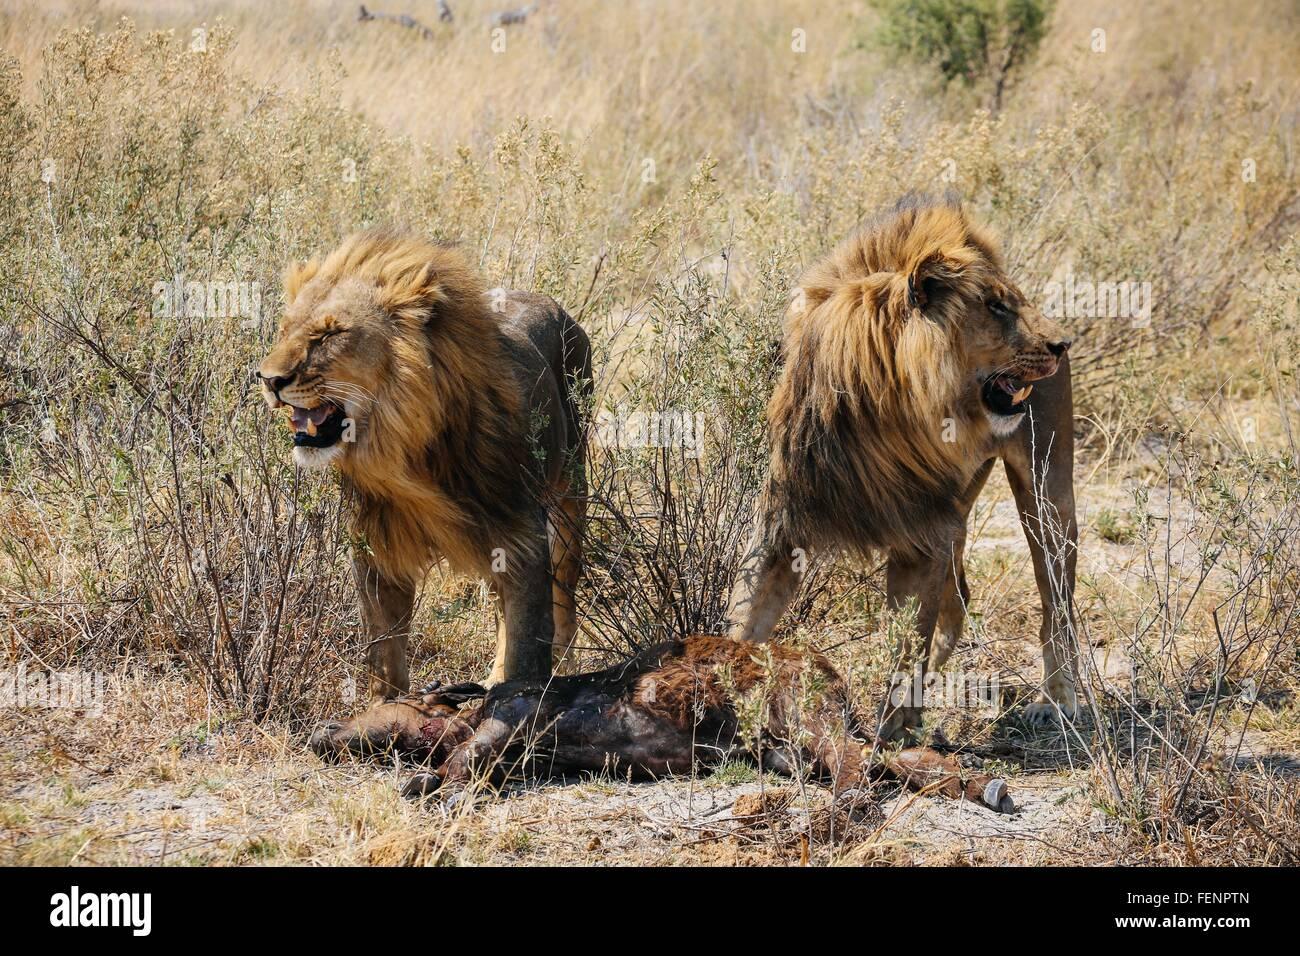 Lions with kill (buffalo calf), Okavango Delta, Botswana - Stock Image